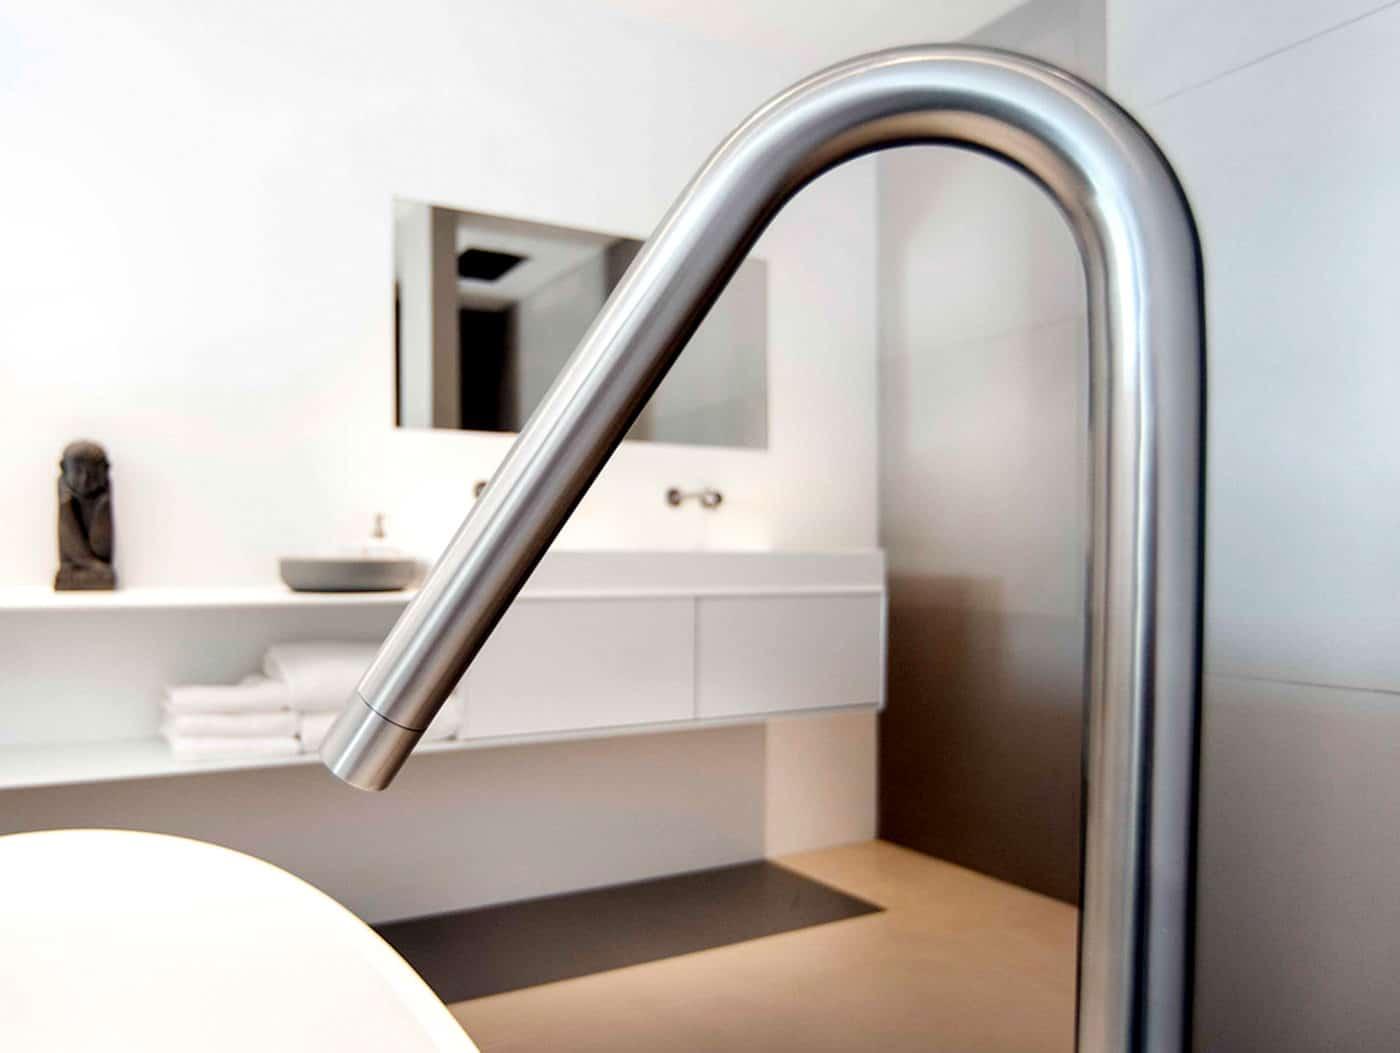 cocoon_freestanding_bath_spout_freestanding_bath_tub_massive_corian